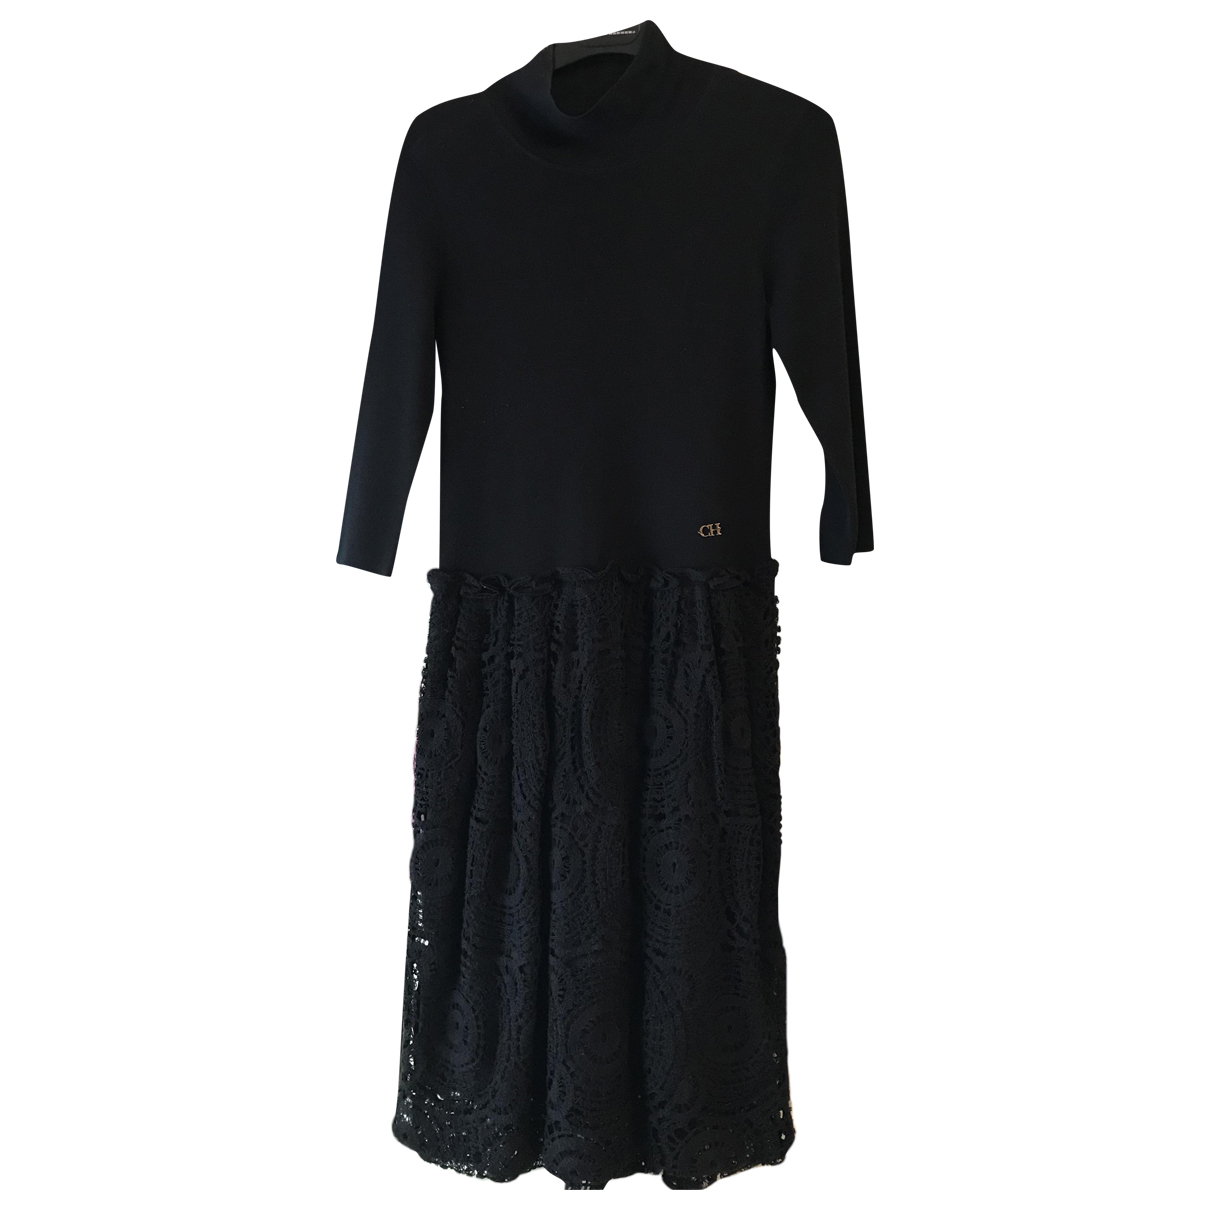 Carolina Herrera N Black Lace dress for Women S International